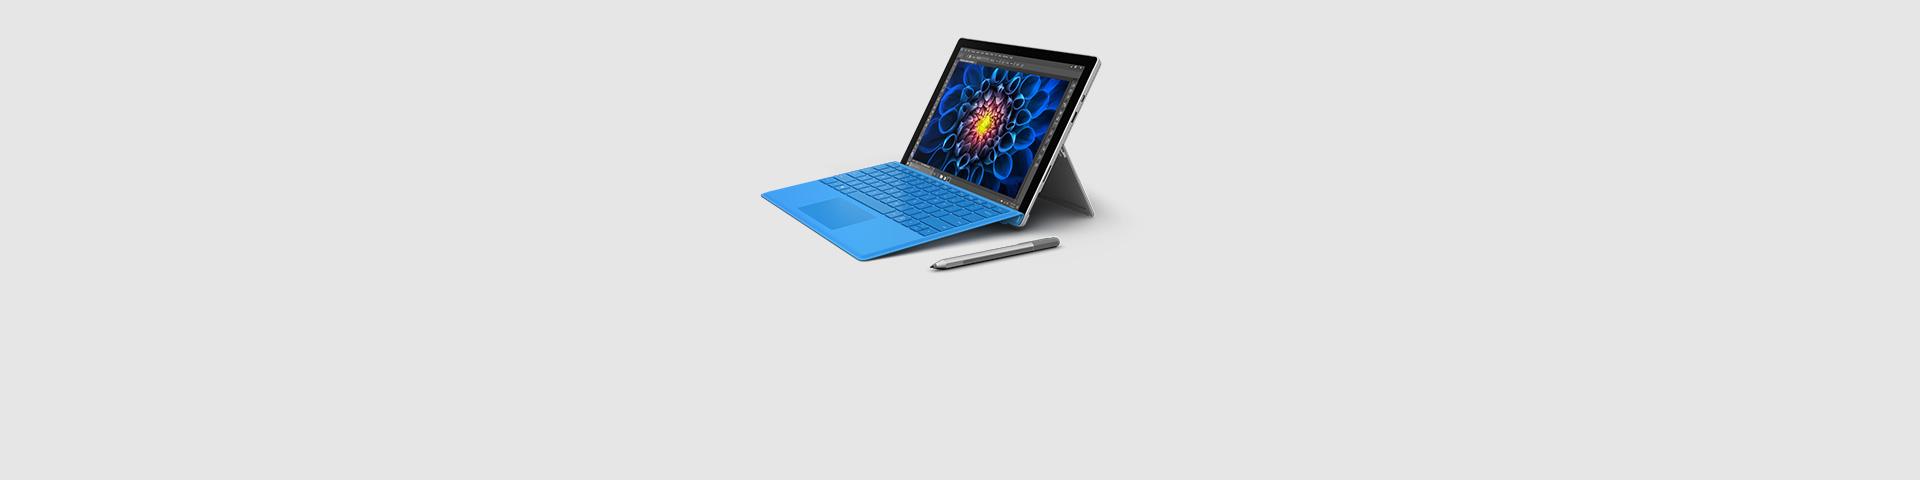 Dispositivo Surface Pro 4